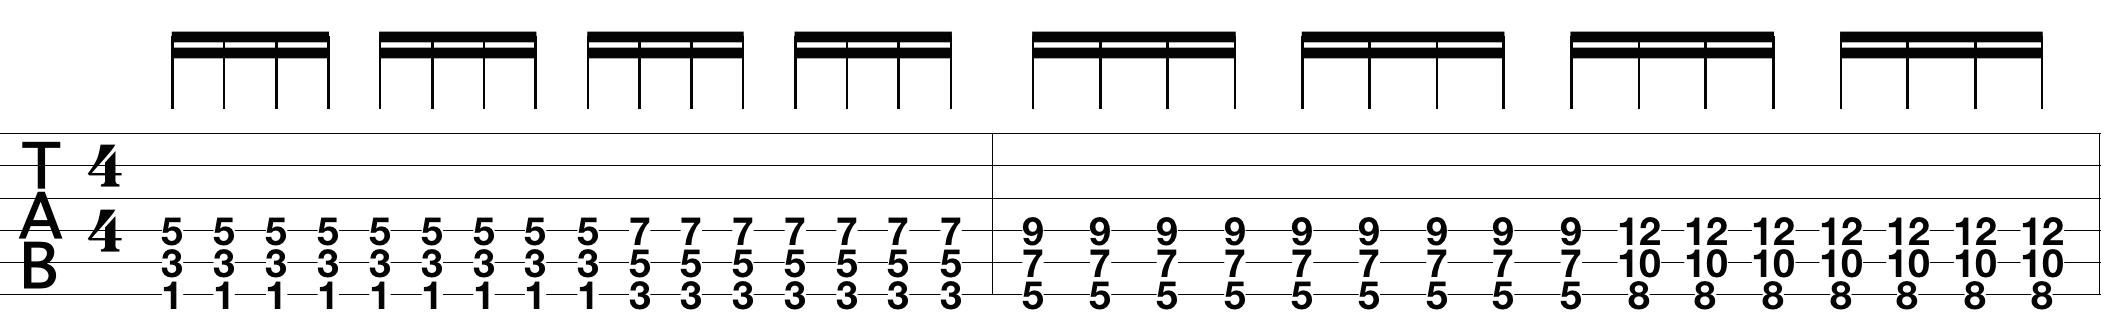 rhythm-guitar-lesson_1.png